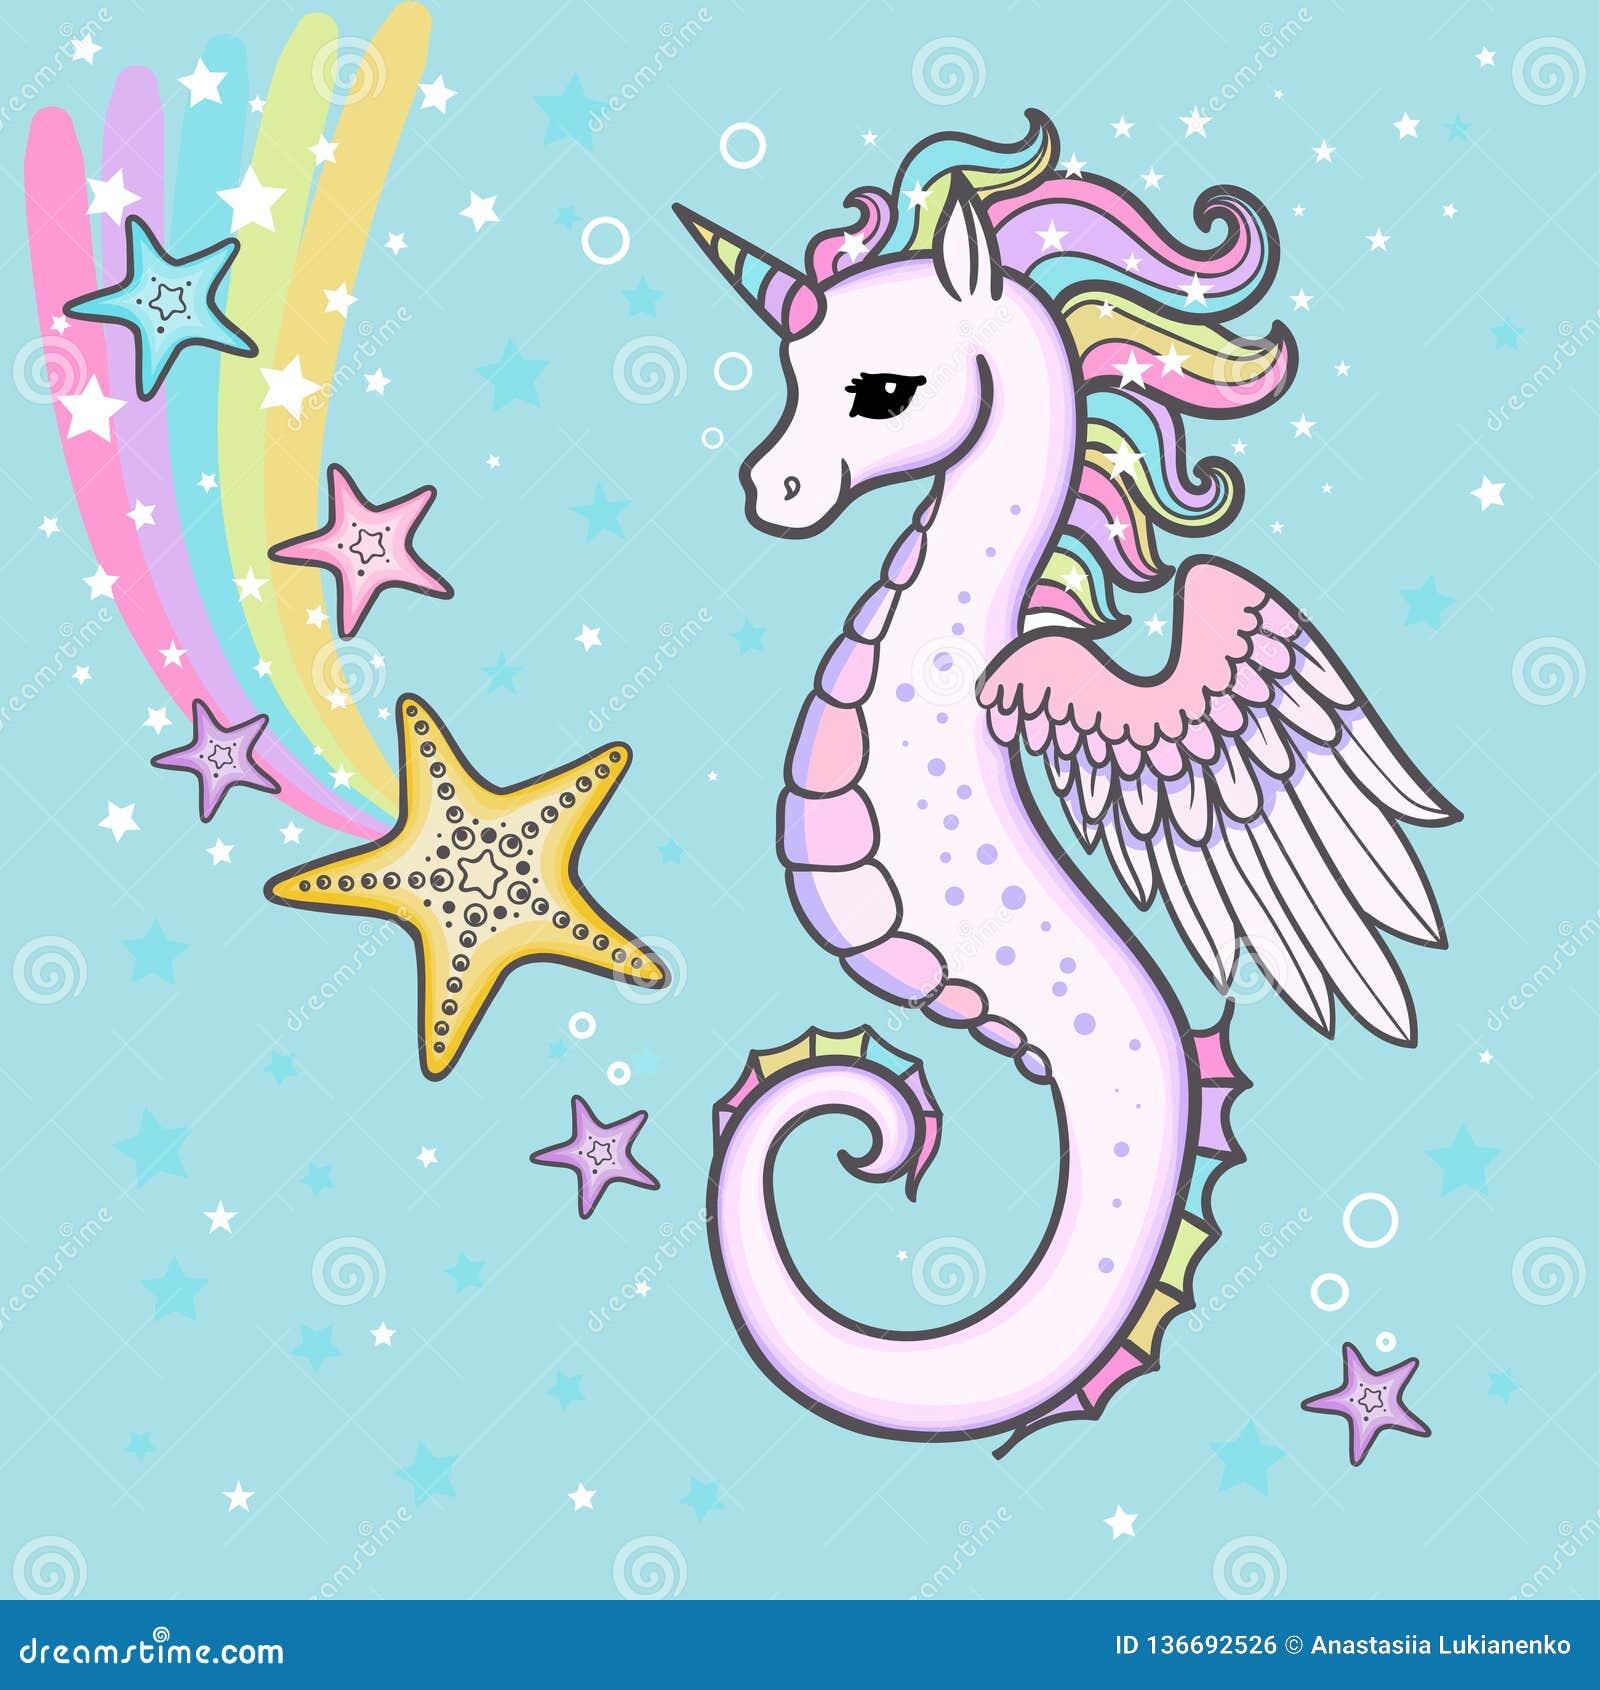 Cute Cartoon Rainbow Seahorse Unicorn With Starfish Vector Stock Vector Illustration Of Happy Creature 136692526